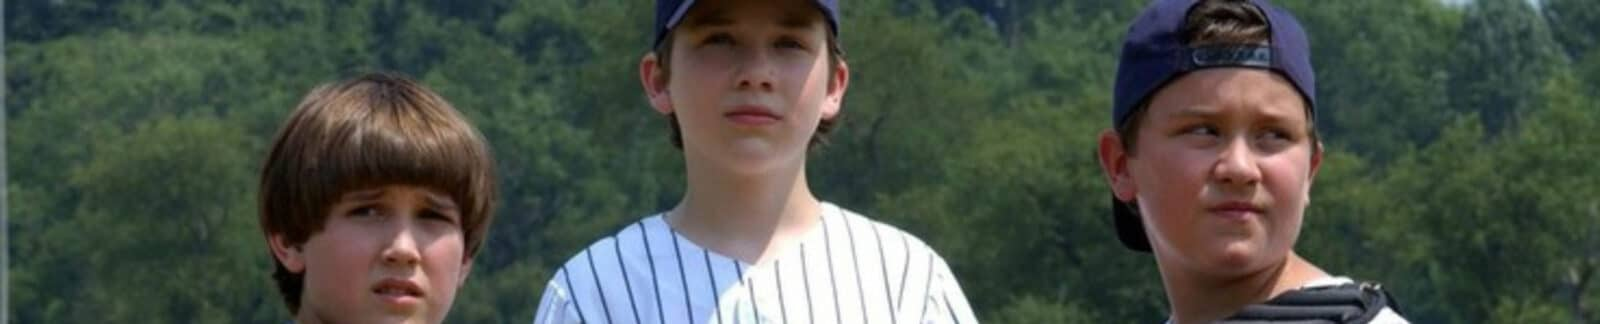 Rounding First baseball movie header